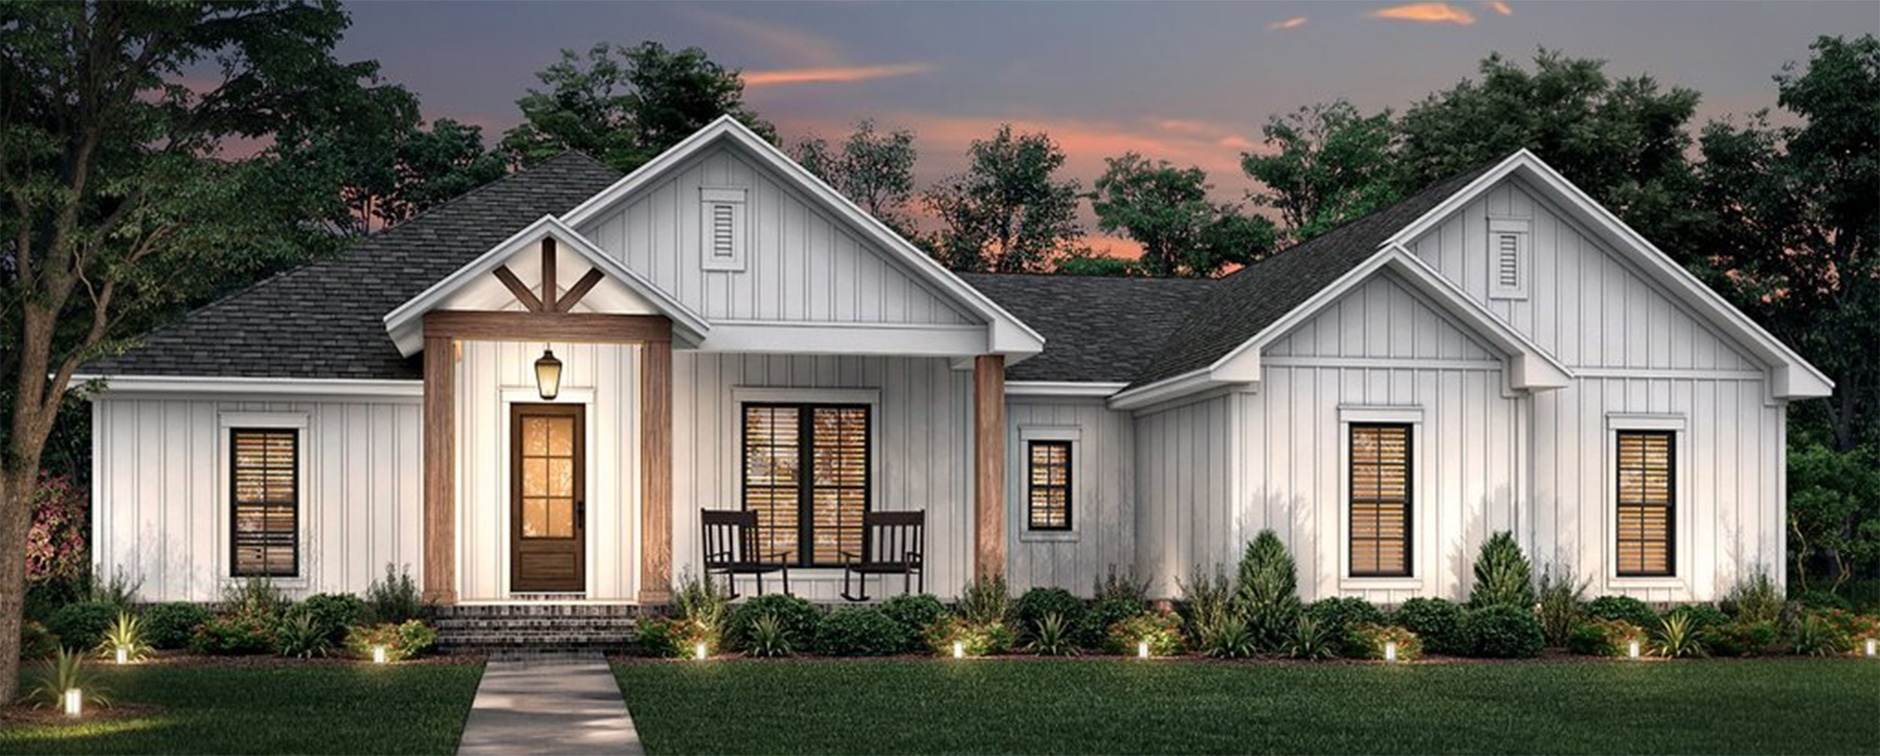 New Farmhouse Plan 430-234 with Photos